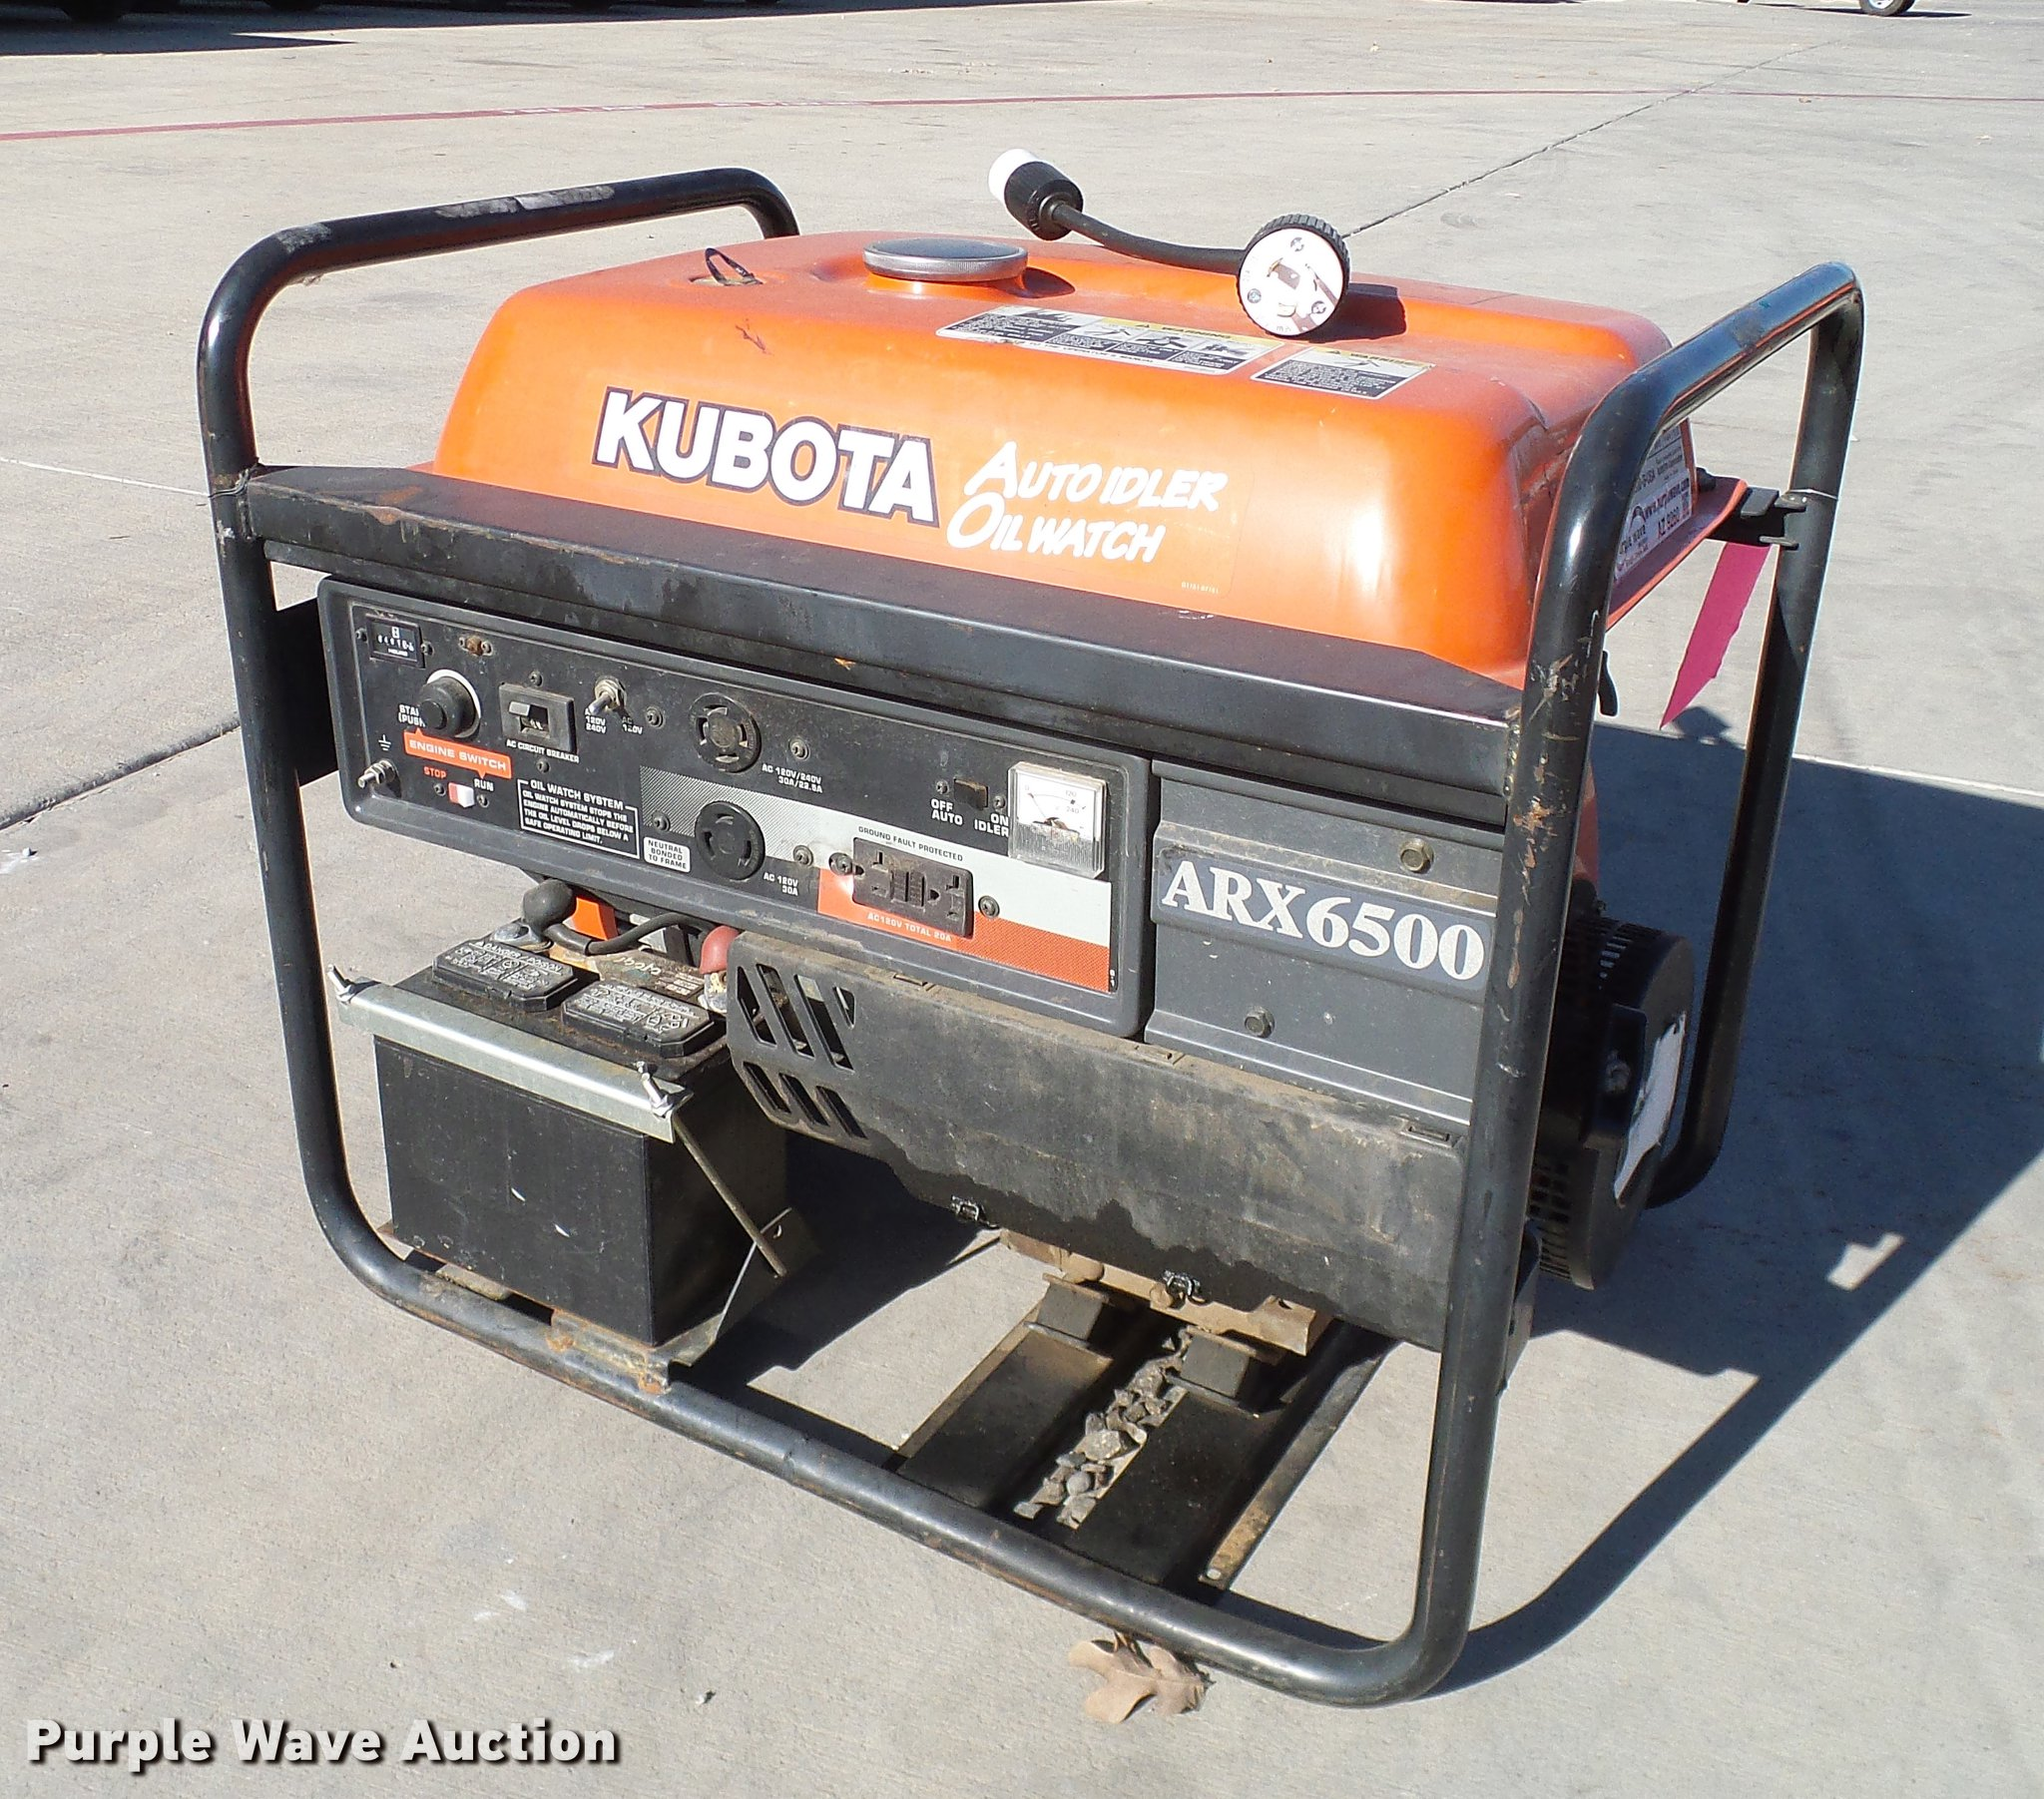 Kubota ARX6500 generator Item AZ9260